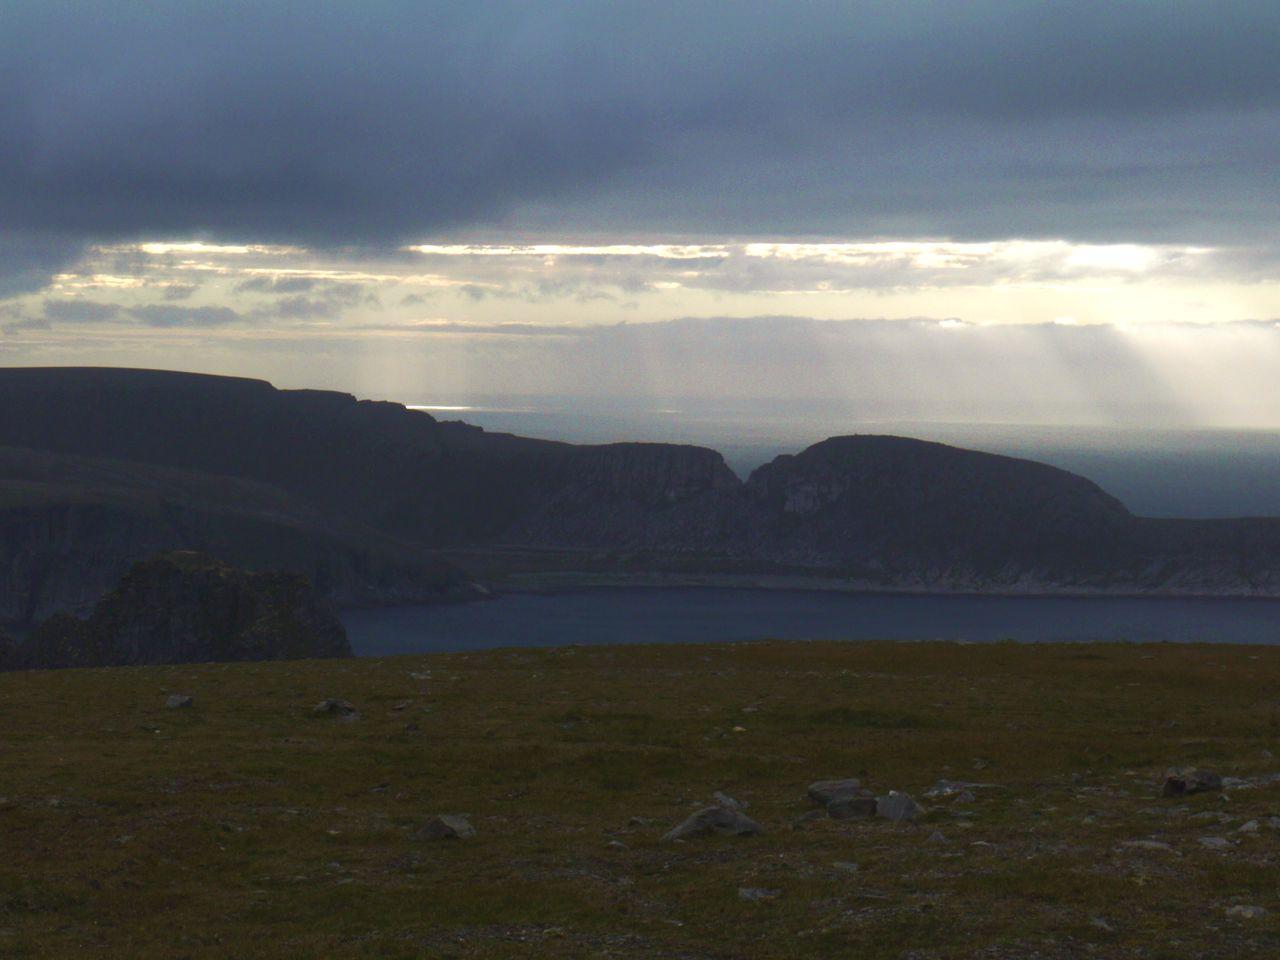 nordkapp, north cape in Norway